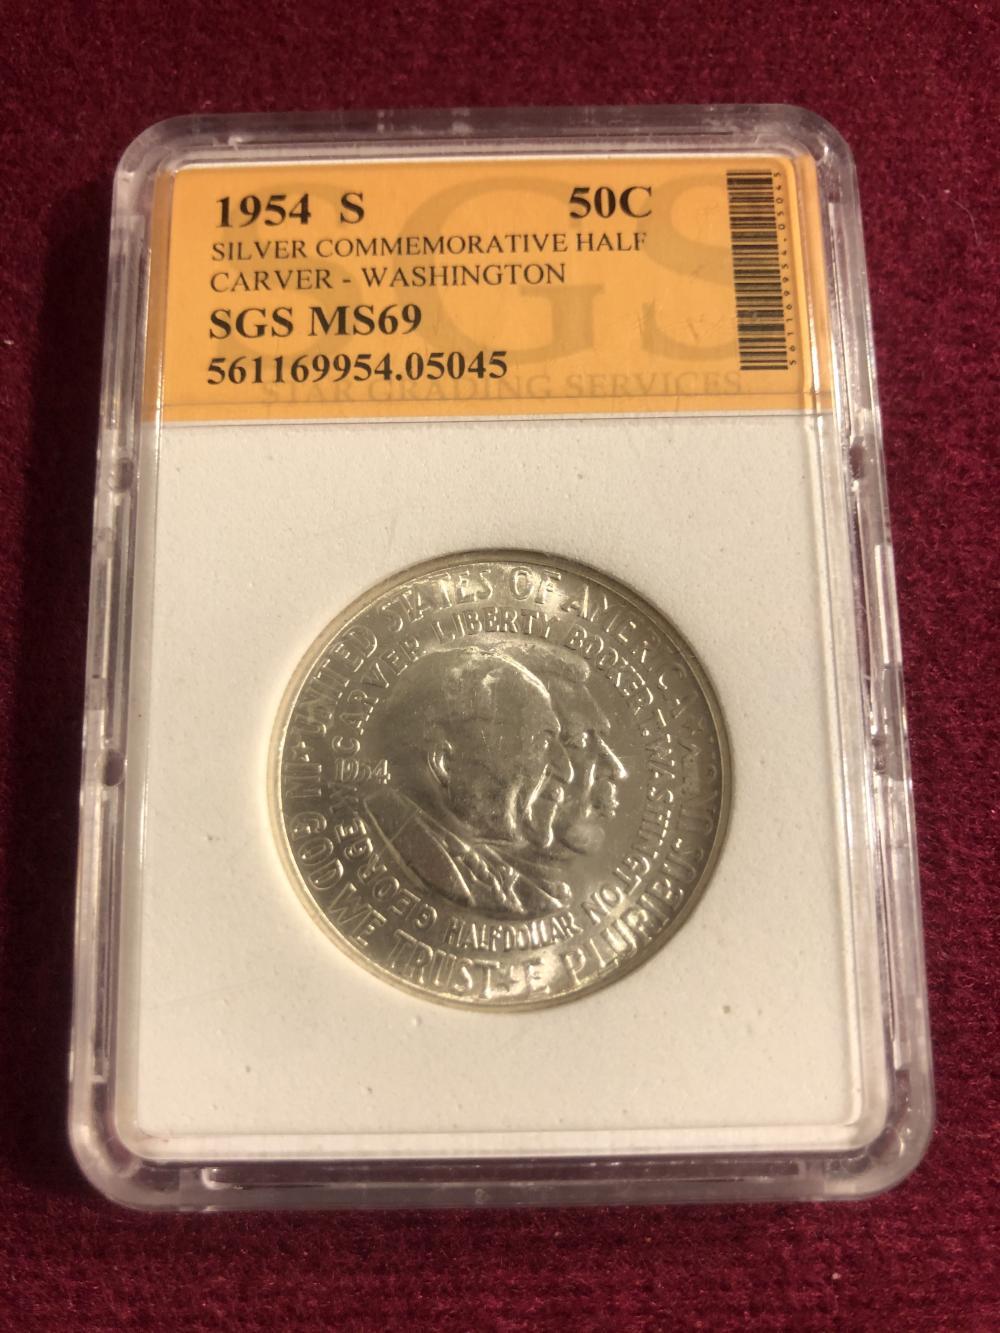 Graded 1954-S silver commemorative half dollar